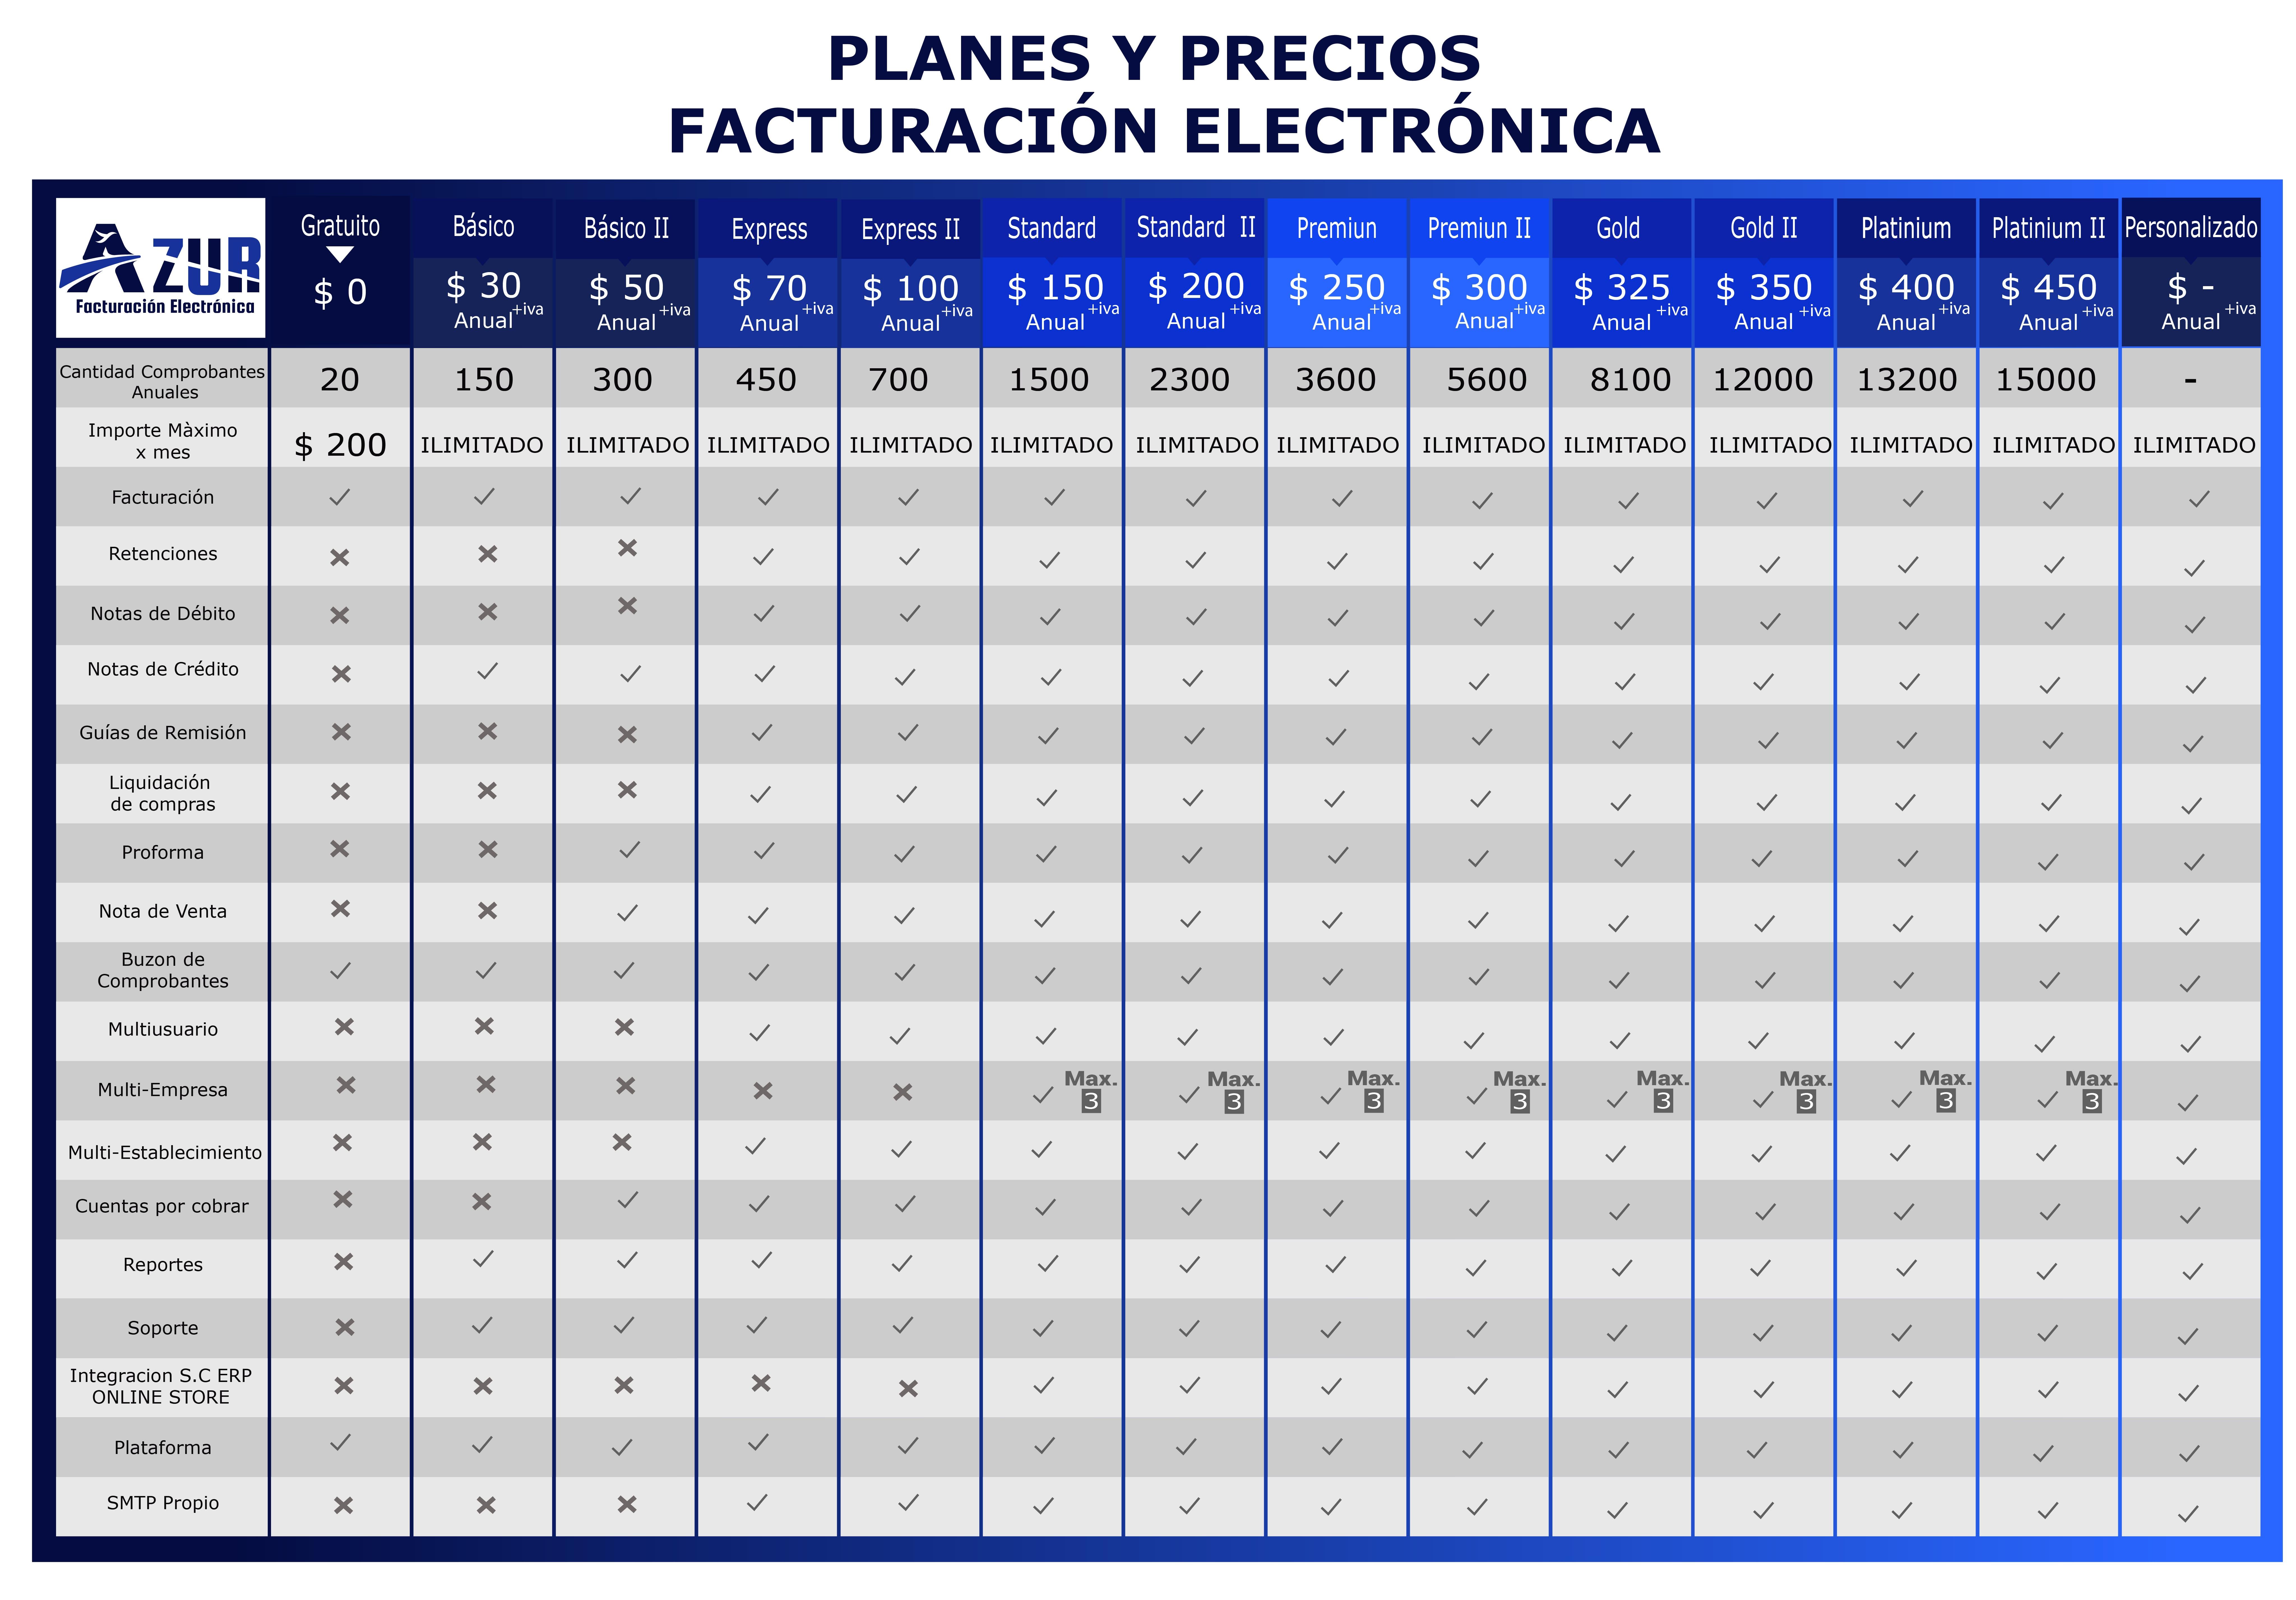 planes        facturacion electronica ecuador guayaquil azur precio